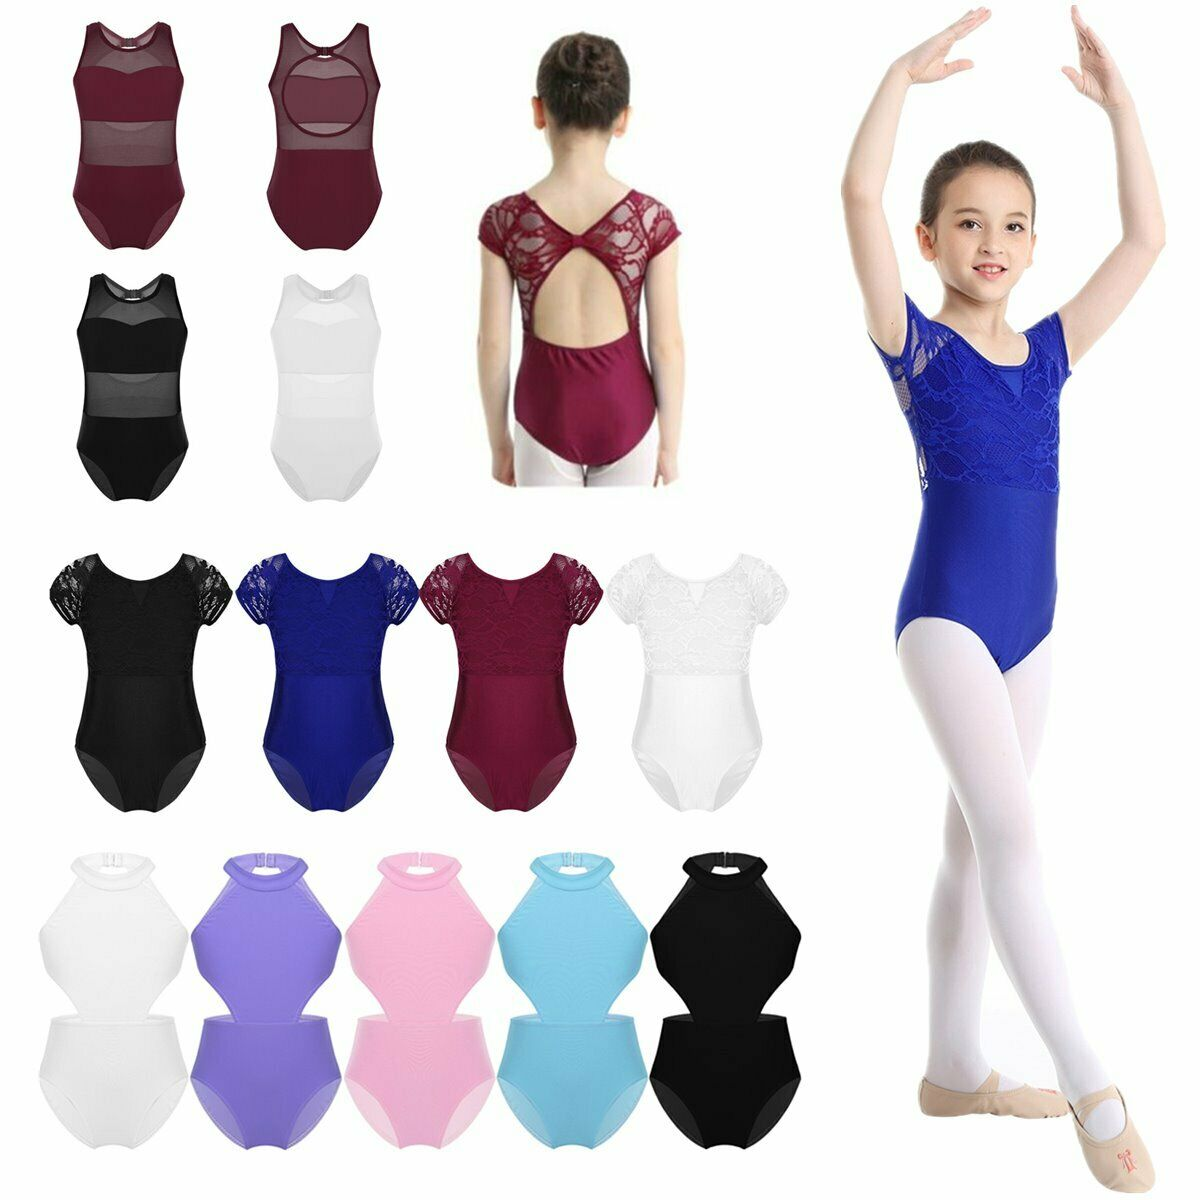 Girls Kids Gymnastics Leotard Dance Ballet Unitards Jumpsuit Mesh Splice Costume